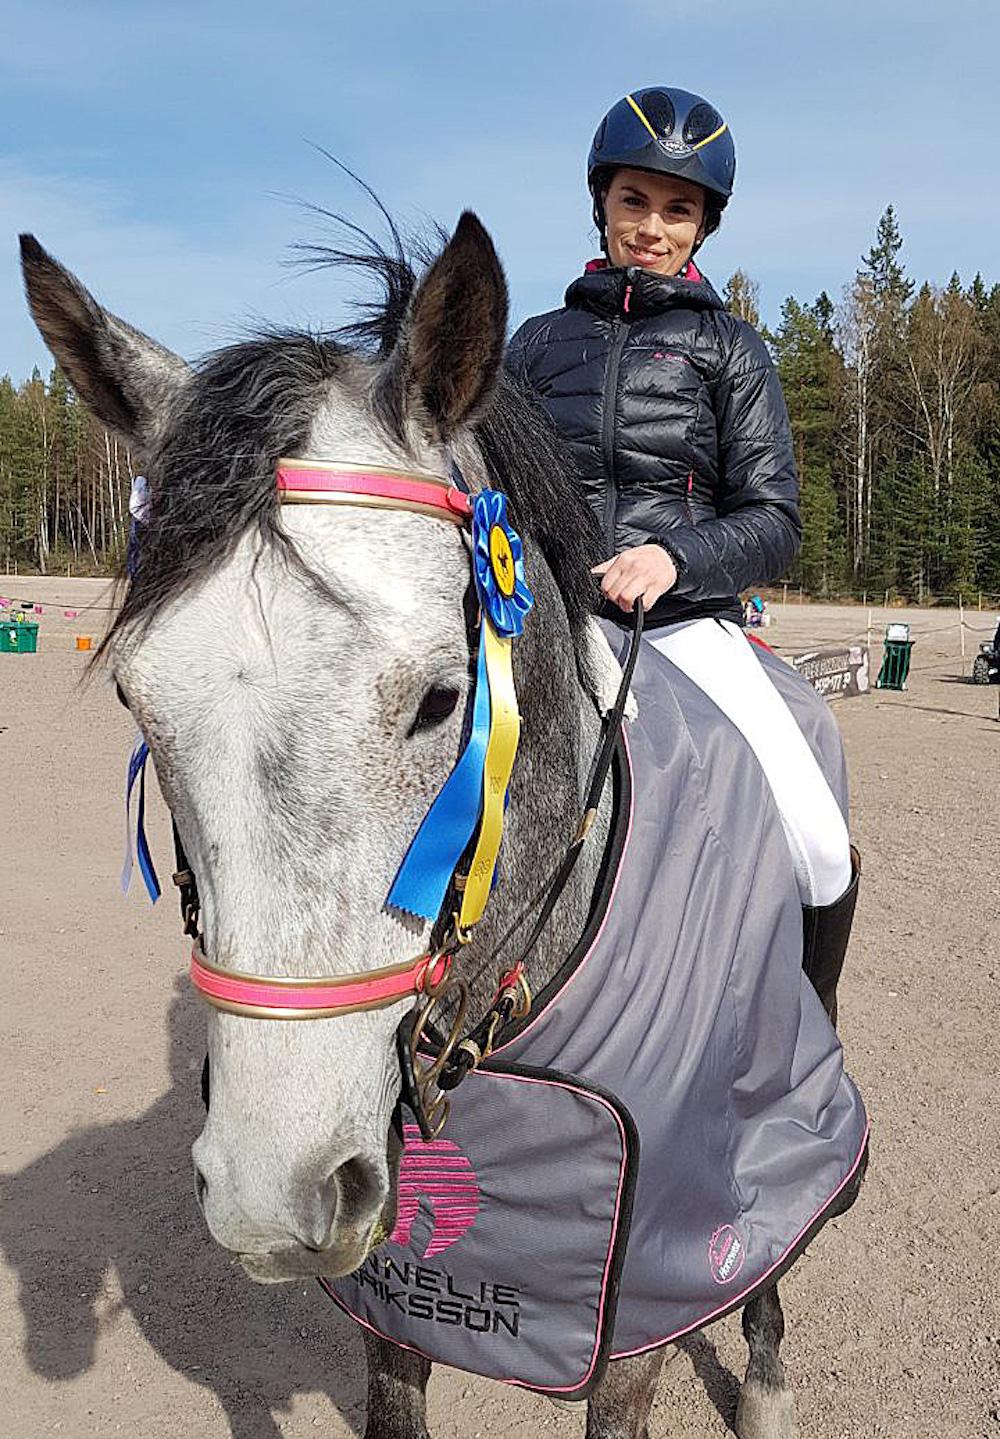 Nynite Flyte Annelie Eriksson 2019 Eva Borg